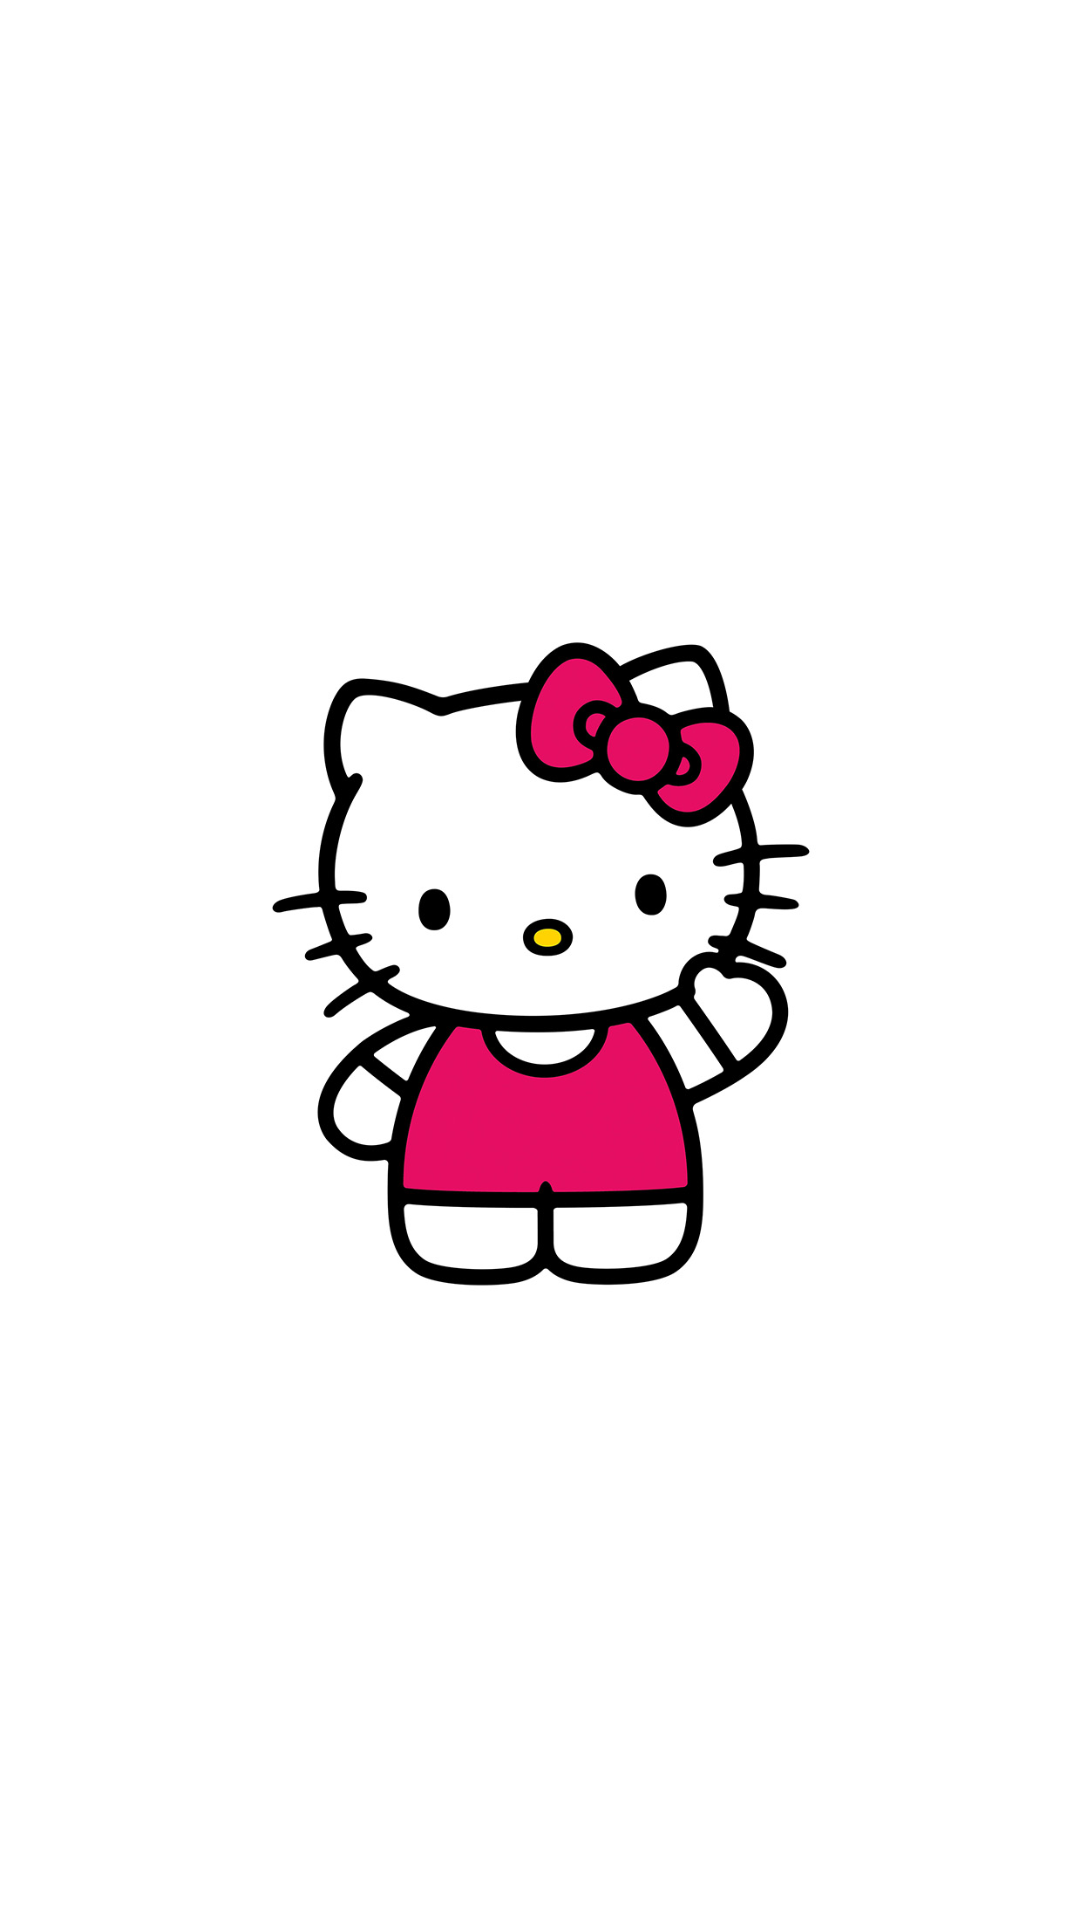 Good Wallpaper High Resolution Hello Kitty - a92aa1f8593ea456d37a3b3fbc0d3eeb  Pic_394124.png